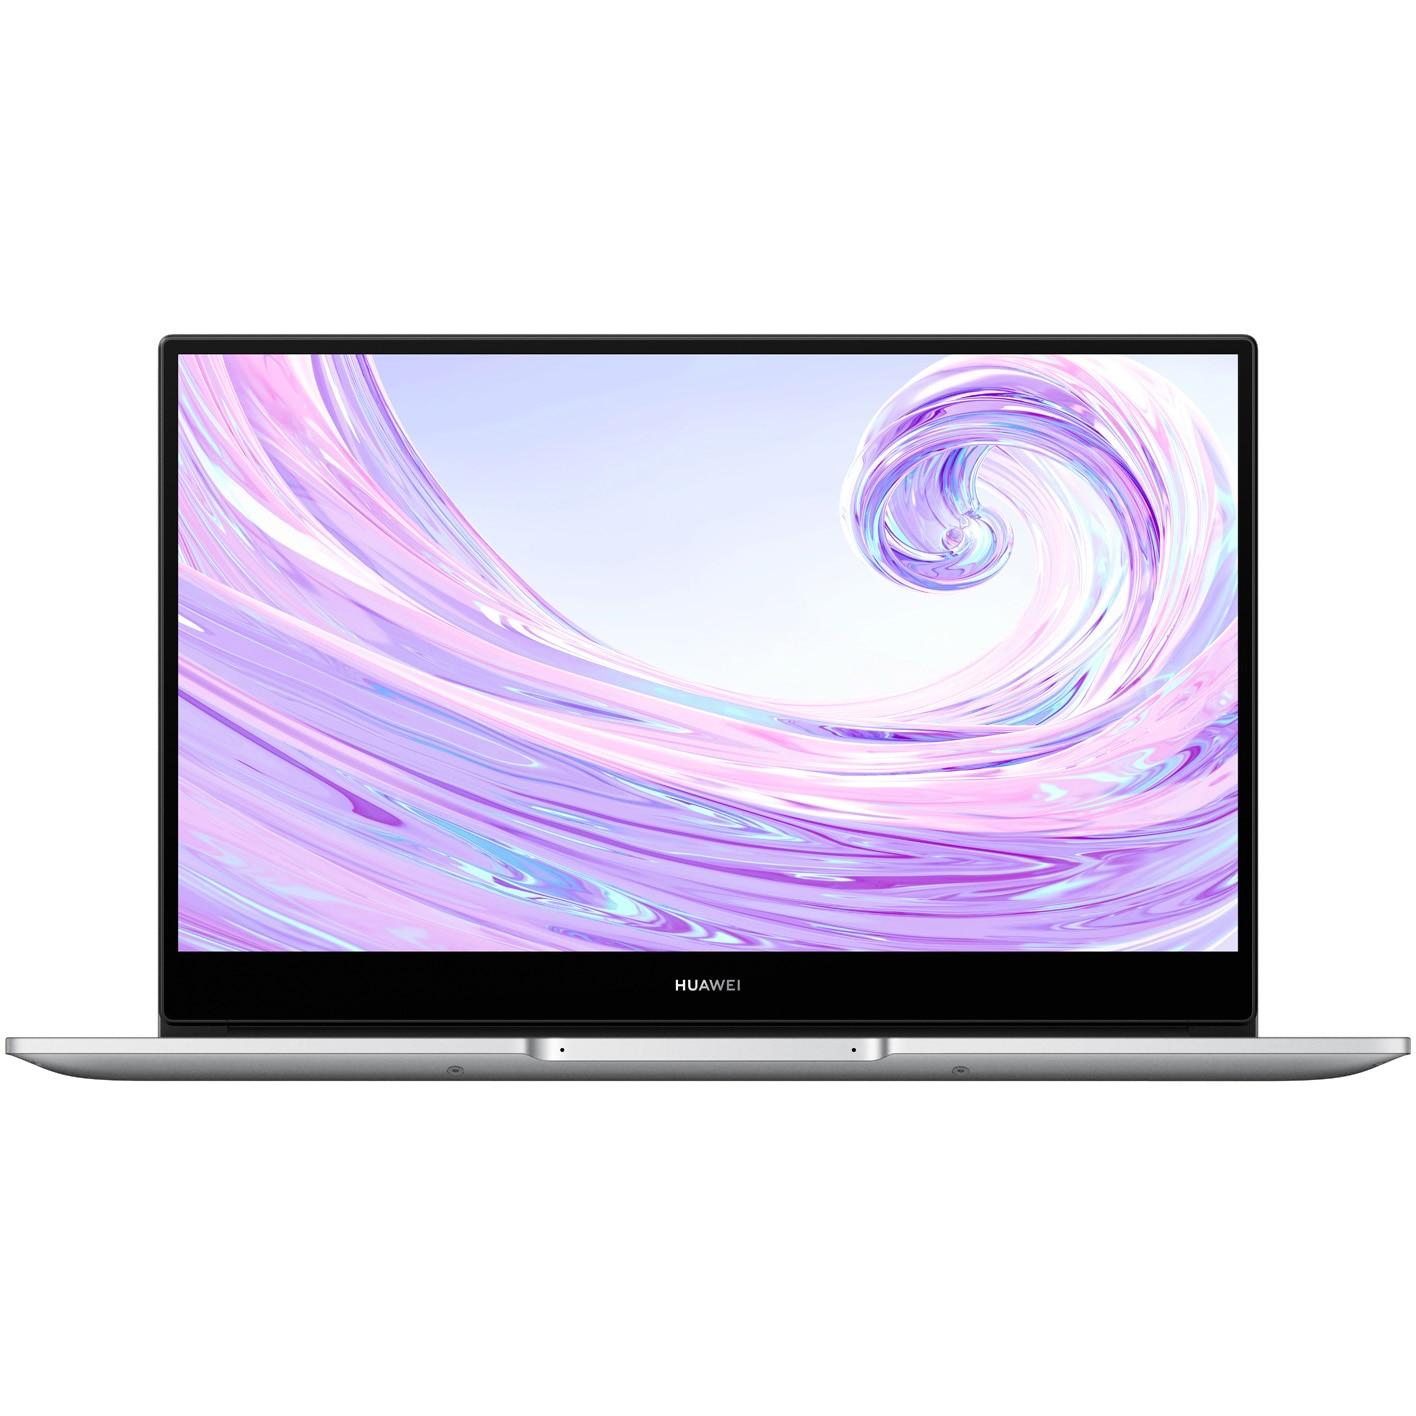 "Fotografie Laptop ultraportabil Huawei MateBook D14 2020 cu procesor AMD Ryzen™ 5 3500U pana la 3.70 GHz, 14"", Full HD, IPS, 8GB, 512GB SSD, Radeon™ Vega 8, Windows 10 Home, Mystic Silver"